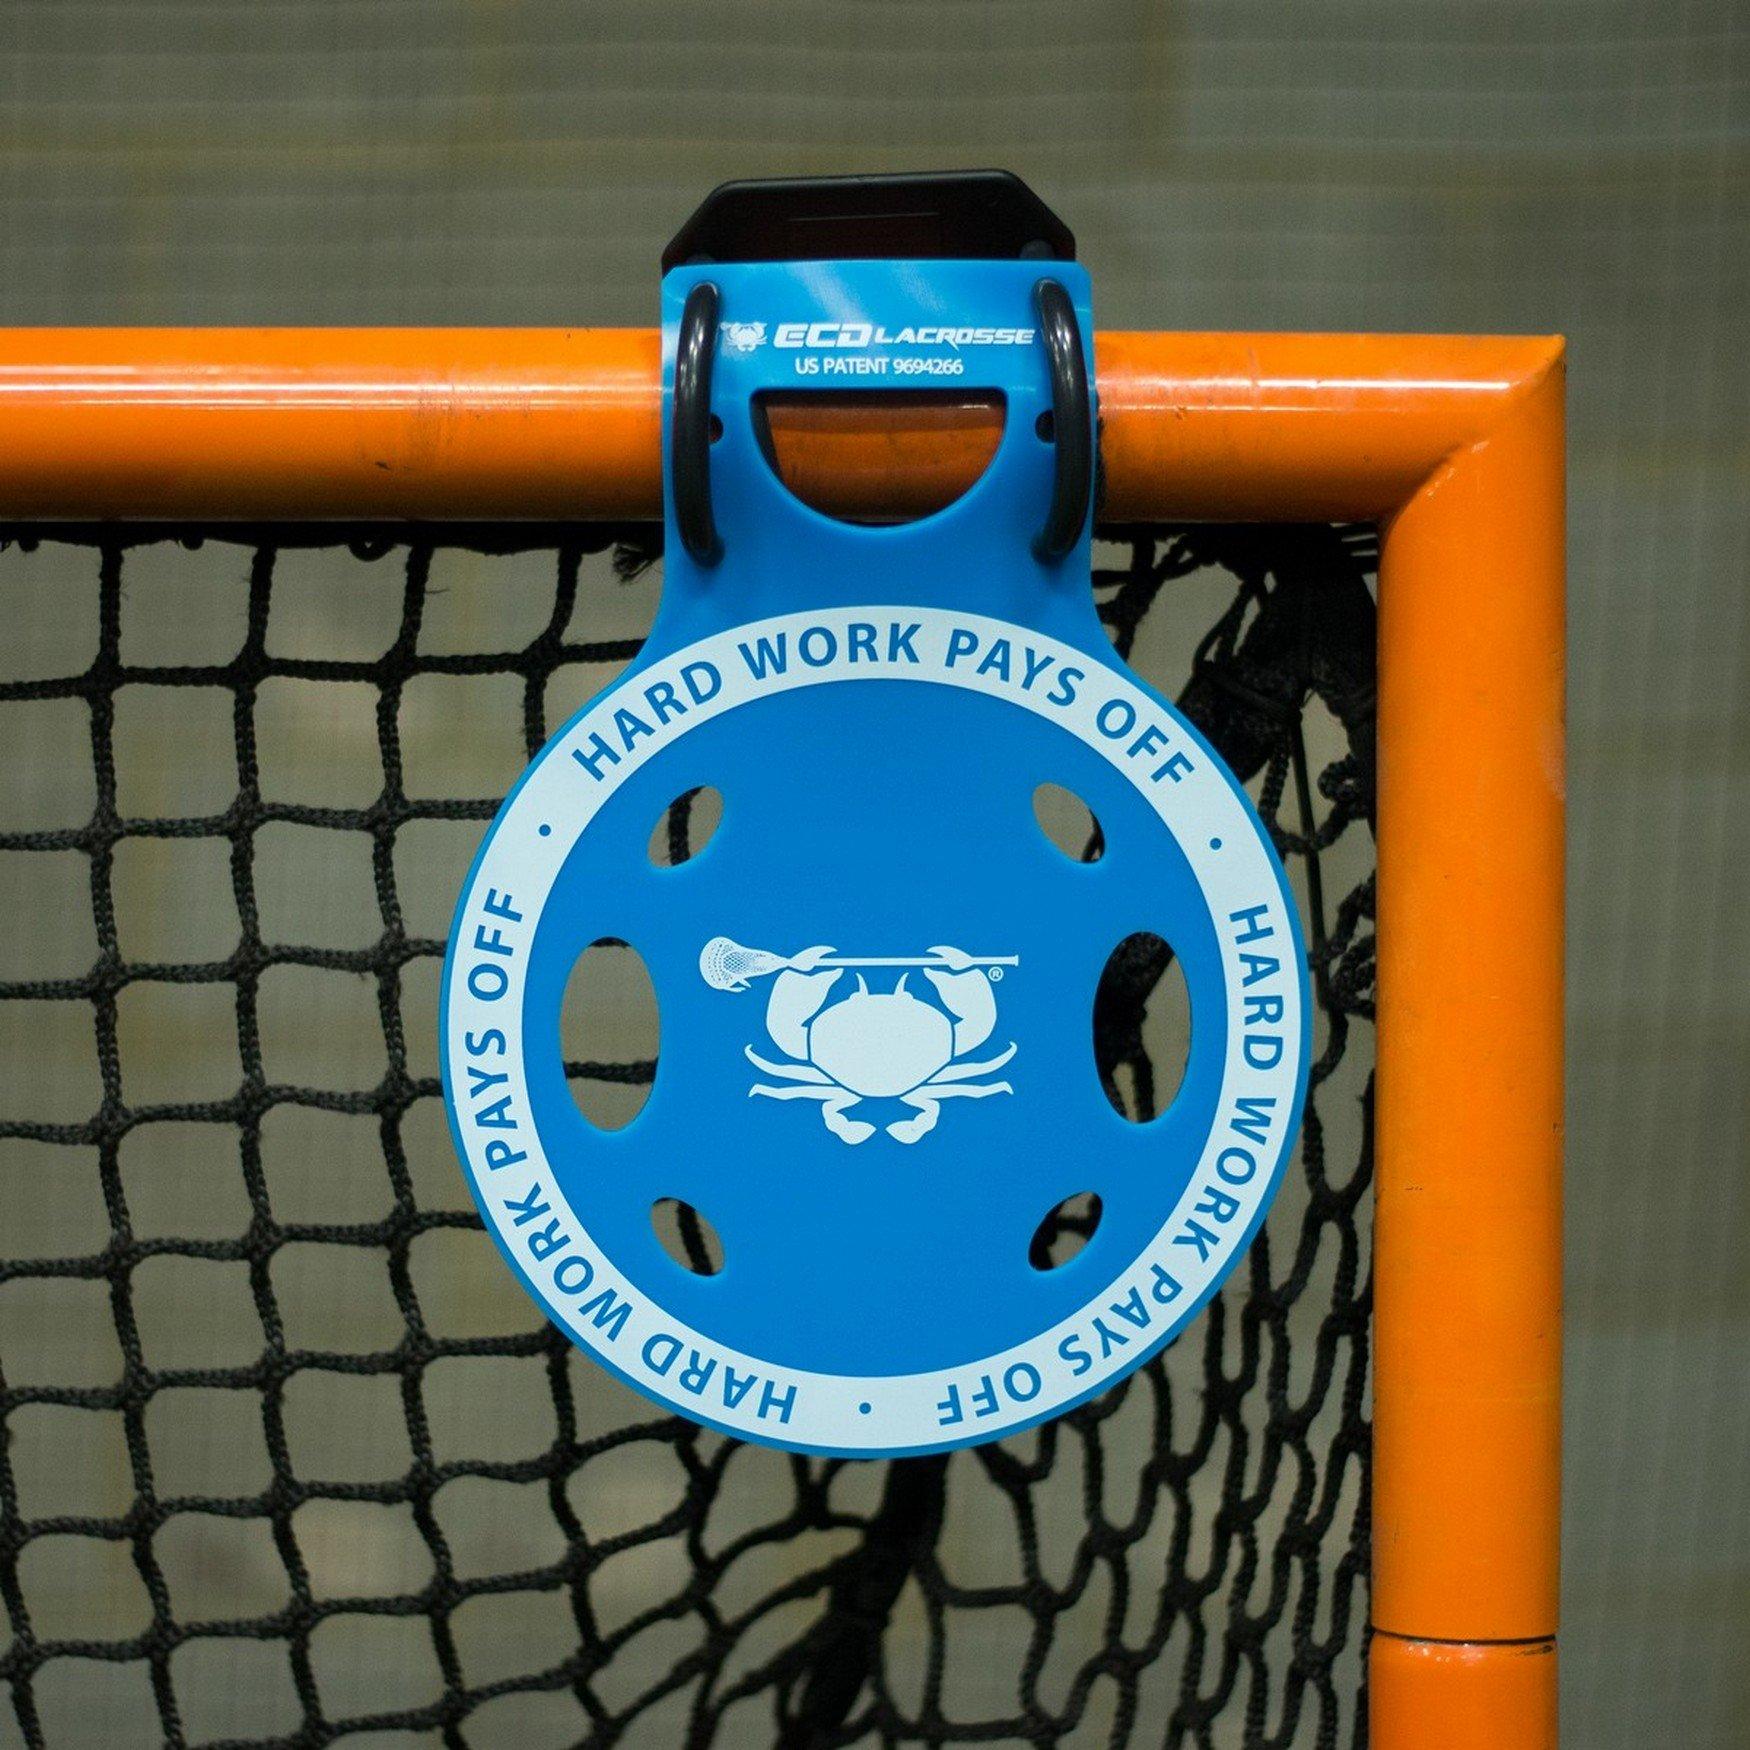 ECD Lacrosse Shooting Target 2-Pack East Coast Dyes Corner Pocket Target 2 Blue Bundle with 1 Performall Sports Bag by ECD Lacrosse (Image #2)